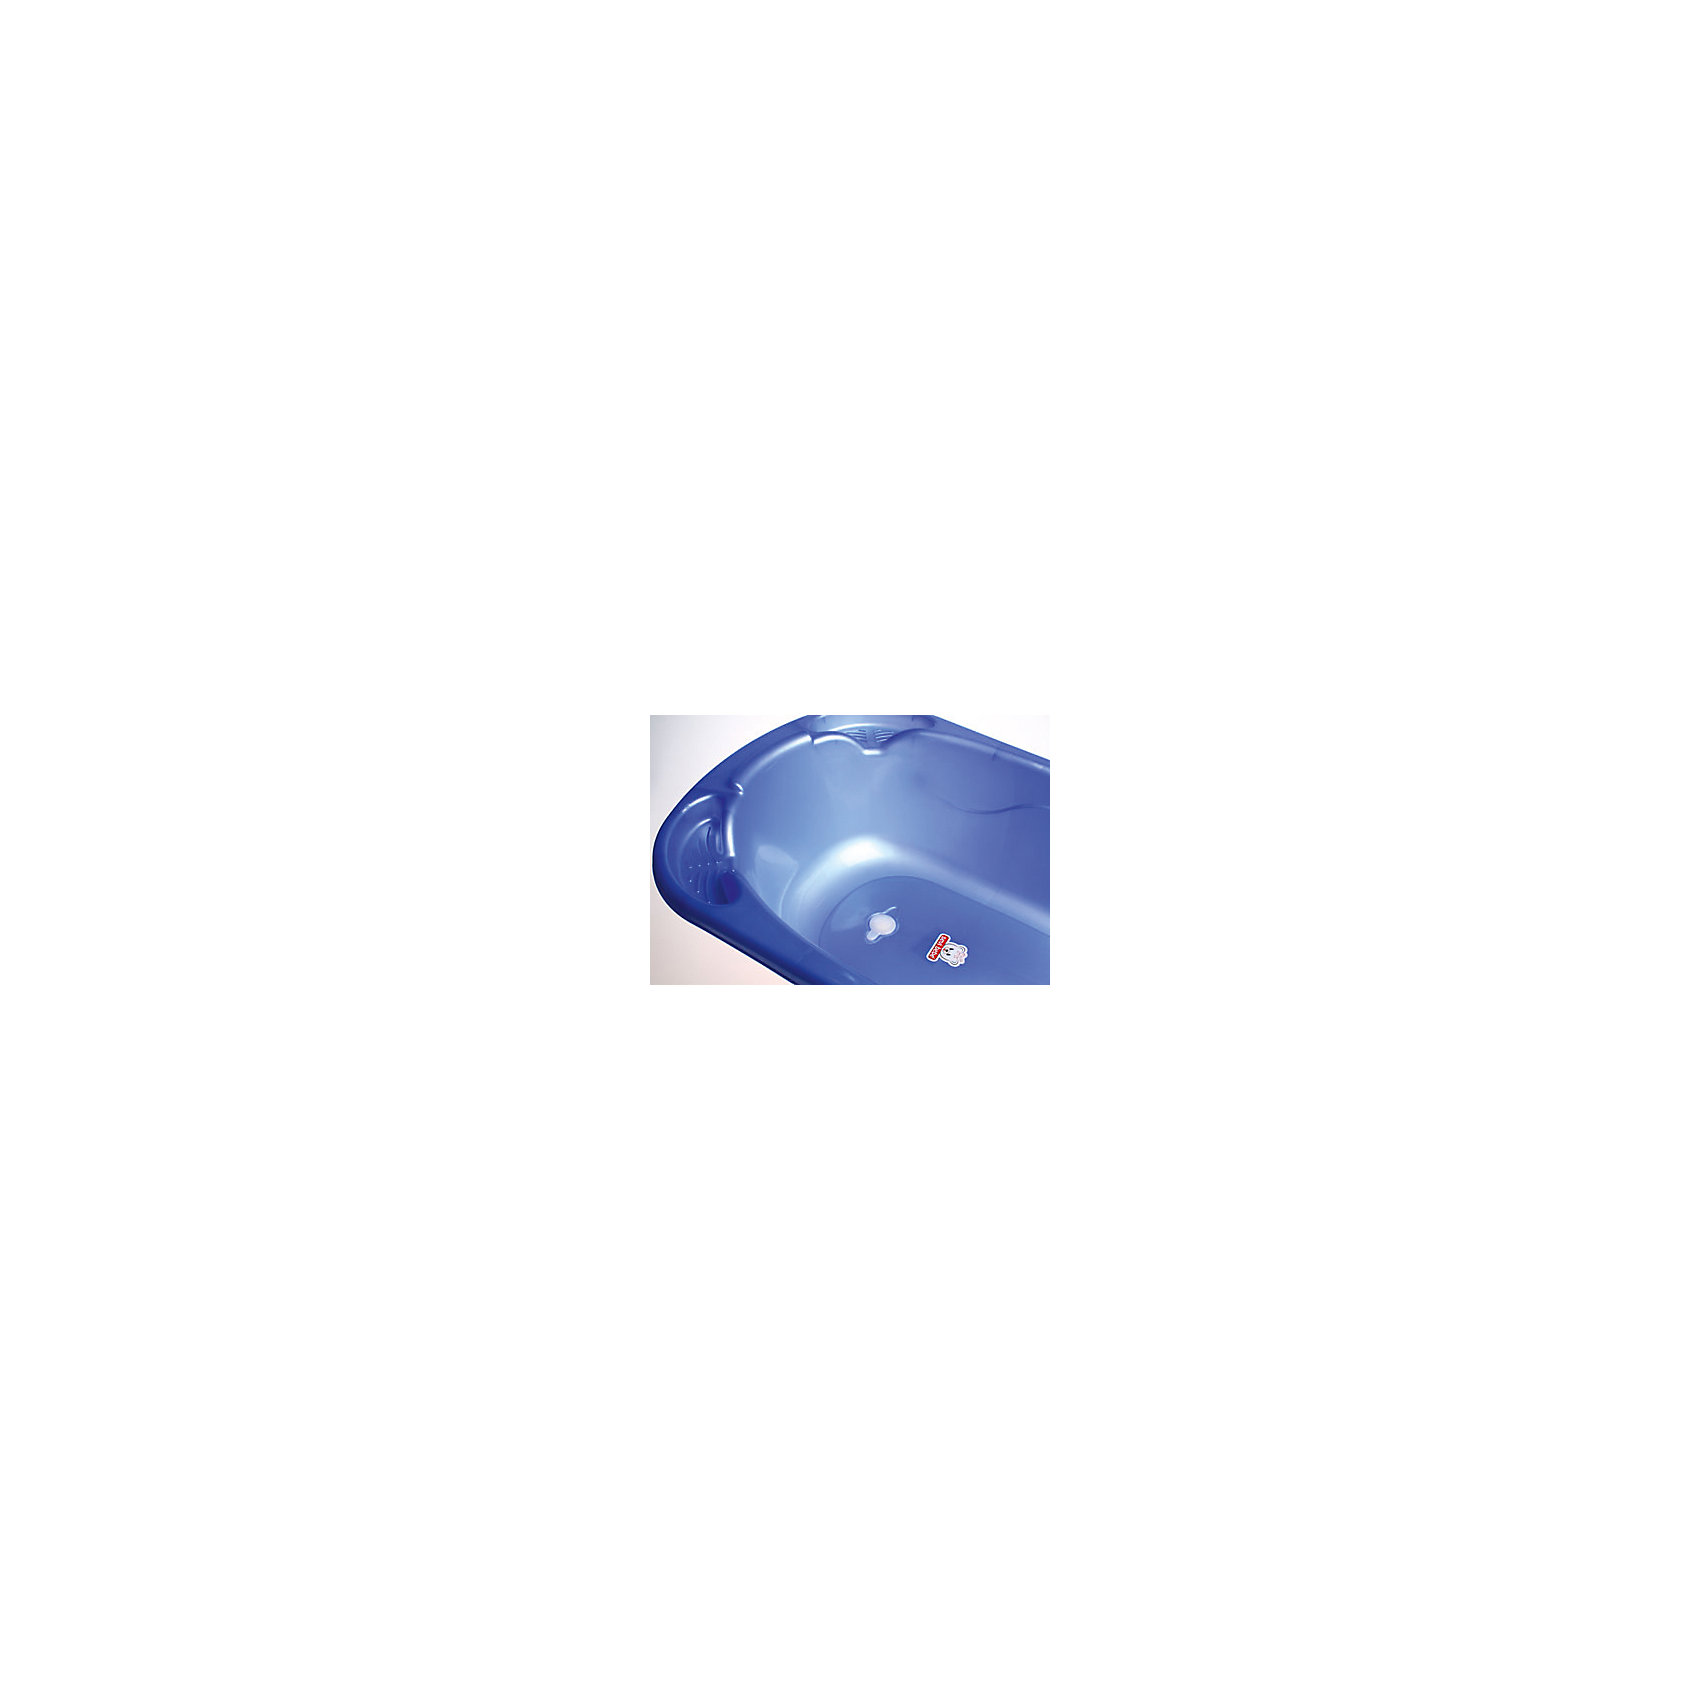 Ванночка со сливом Sevi baby, голубой (Sevi Baby)